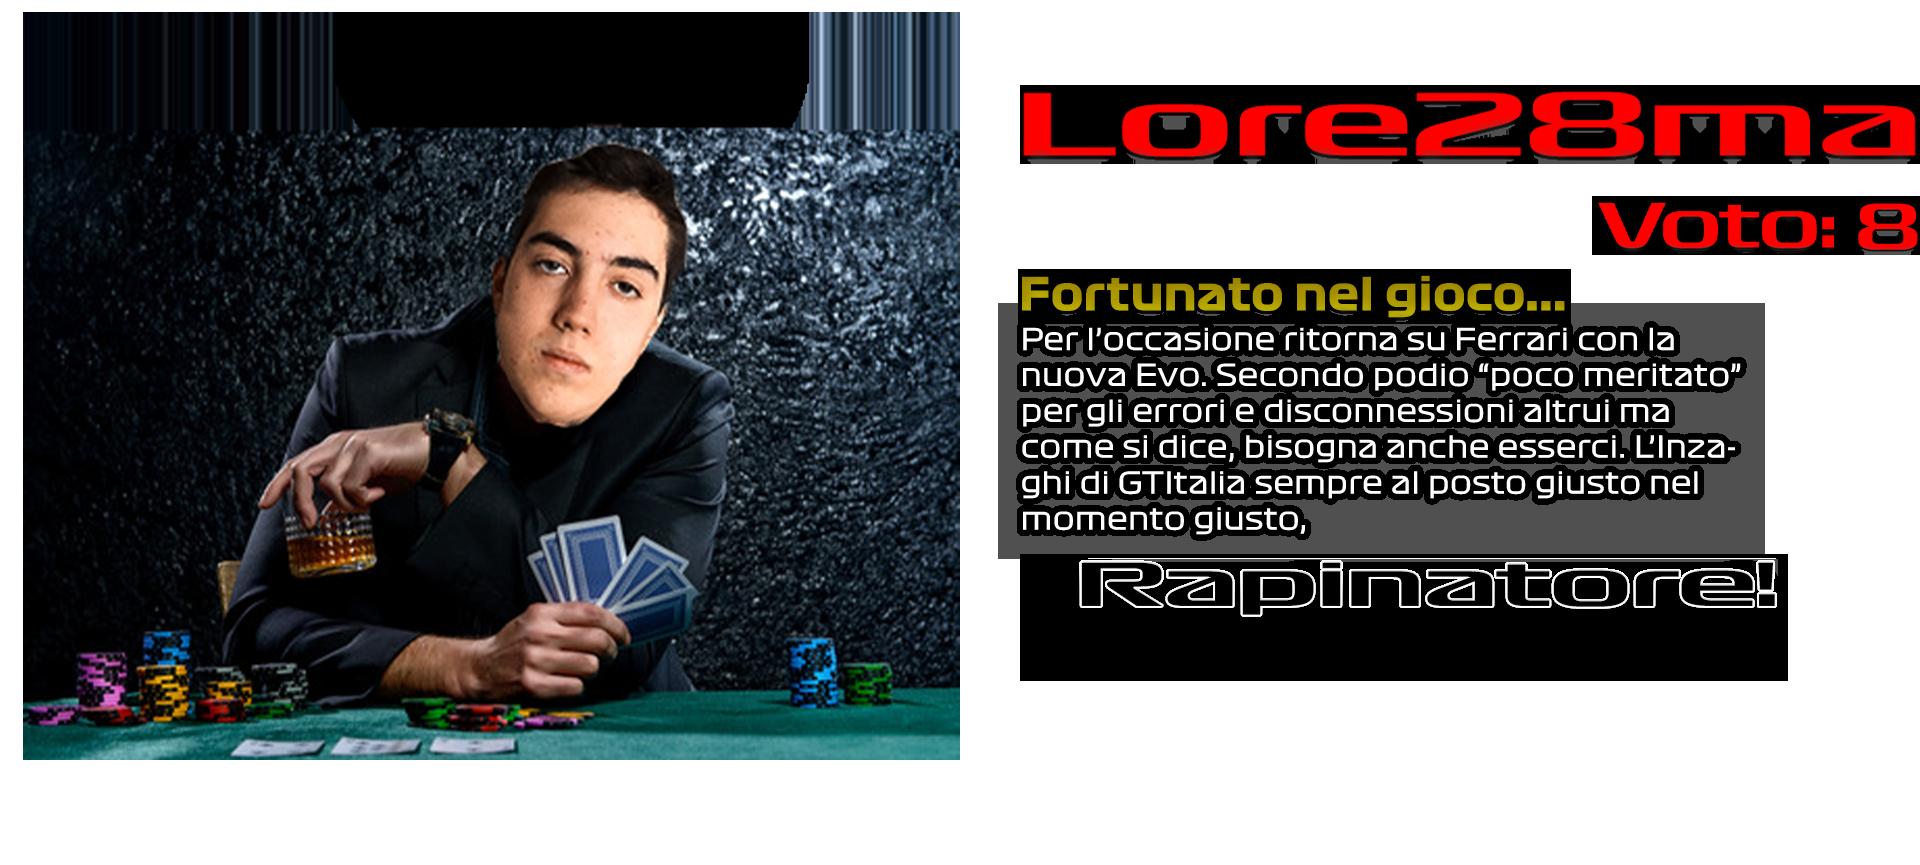 Garetta stasera random GT6-3-lore-png